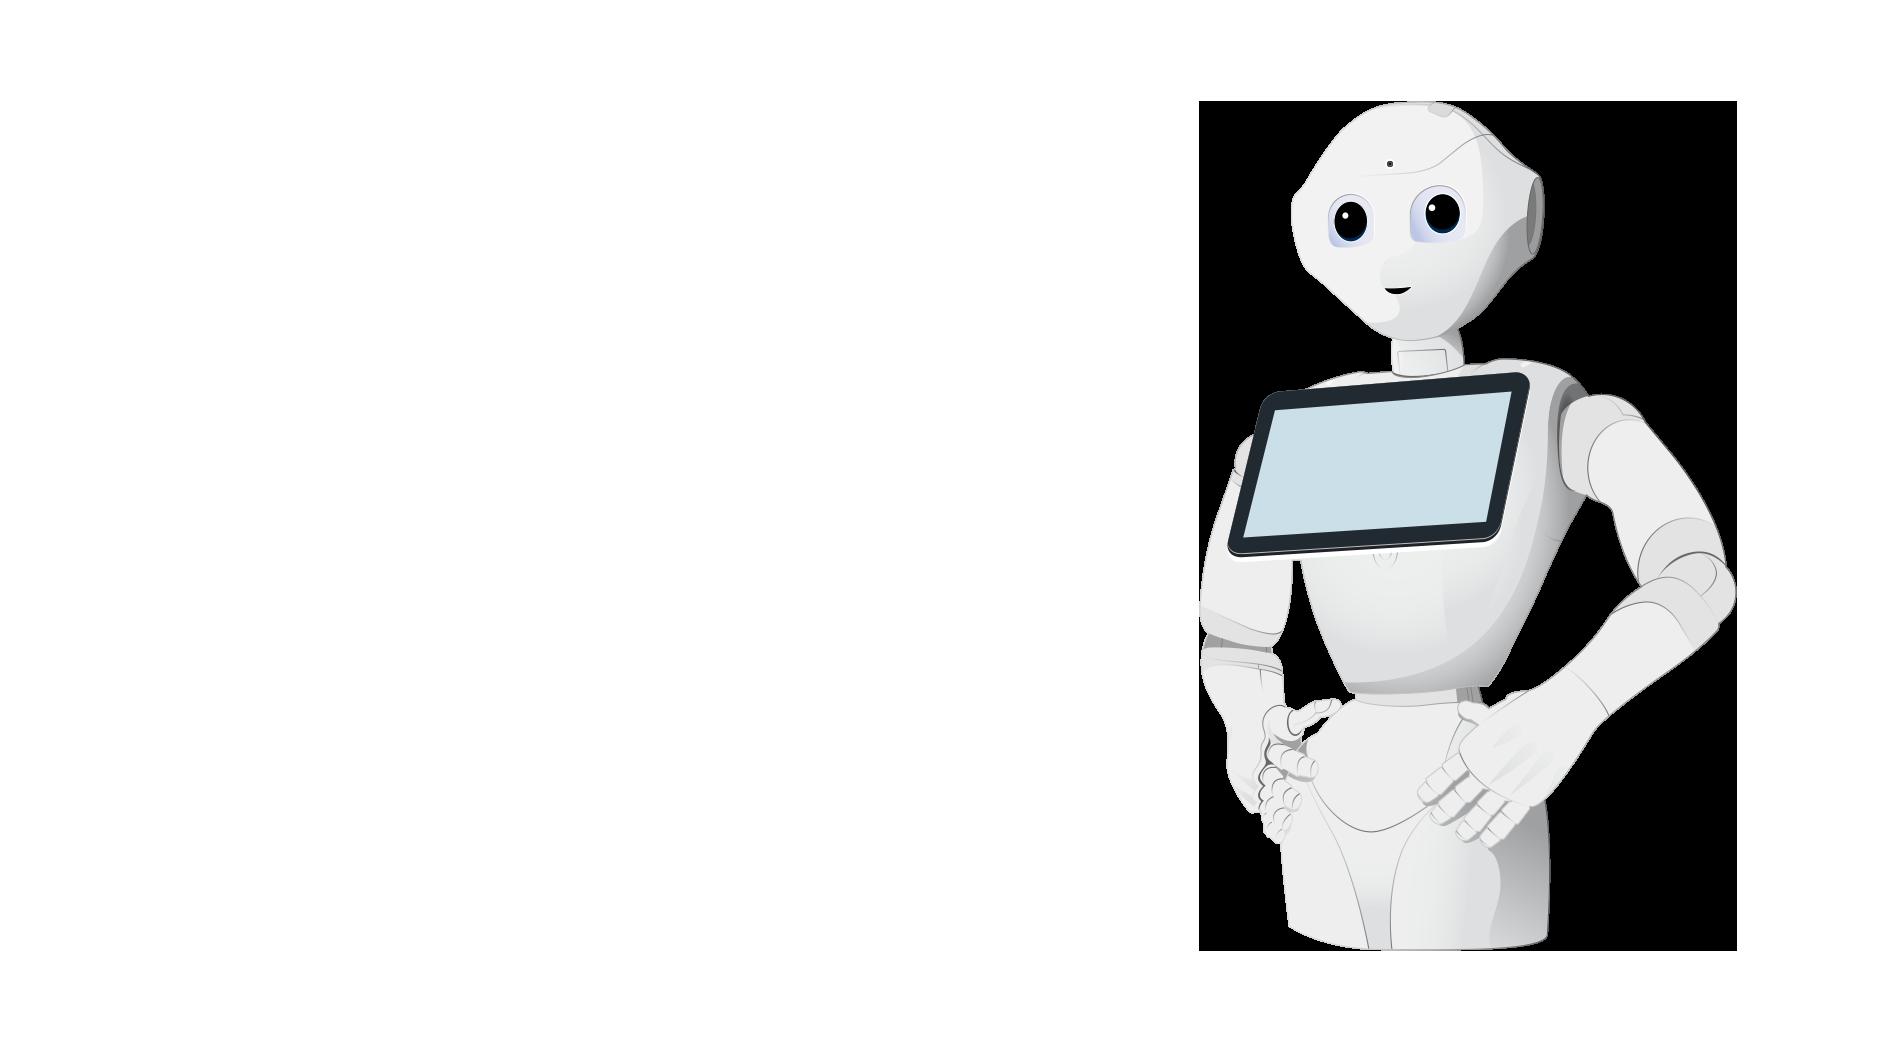 Penny robot